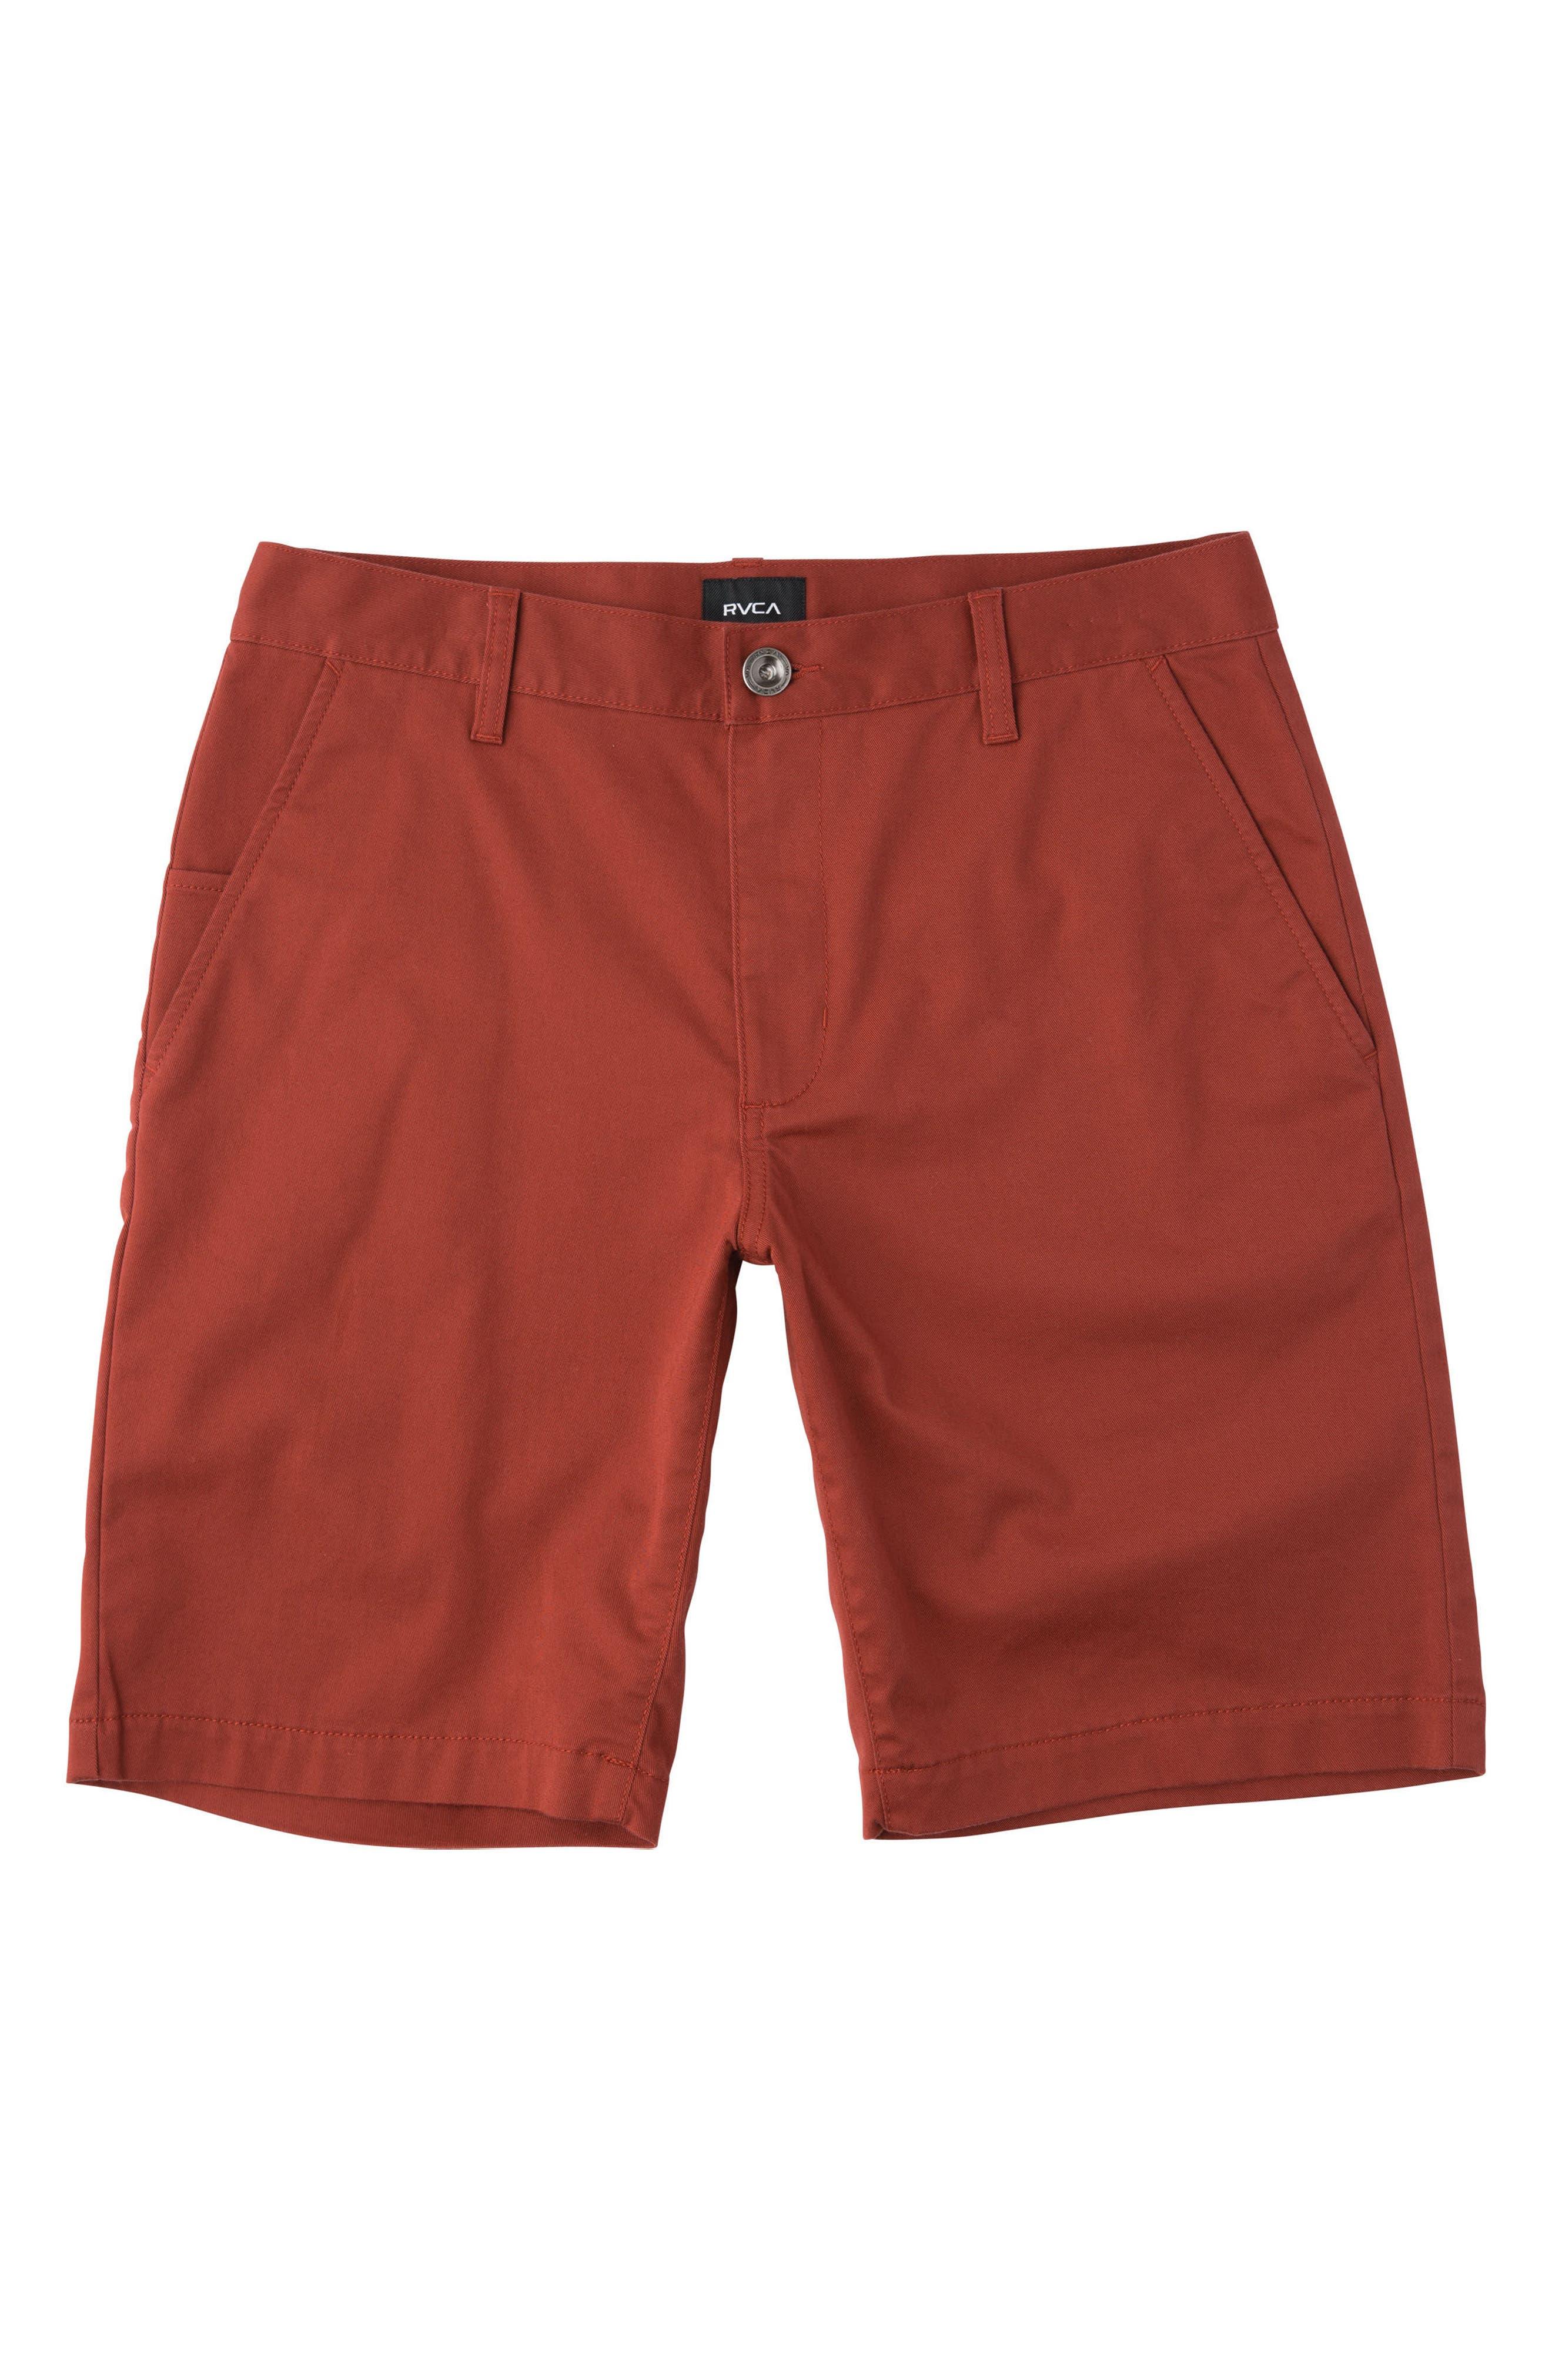 Alternate Image 1 Selected - RVCA 'Weekday' Shorts (Big Boys)